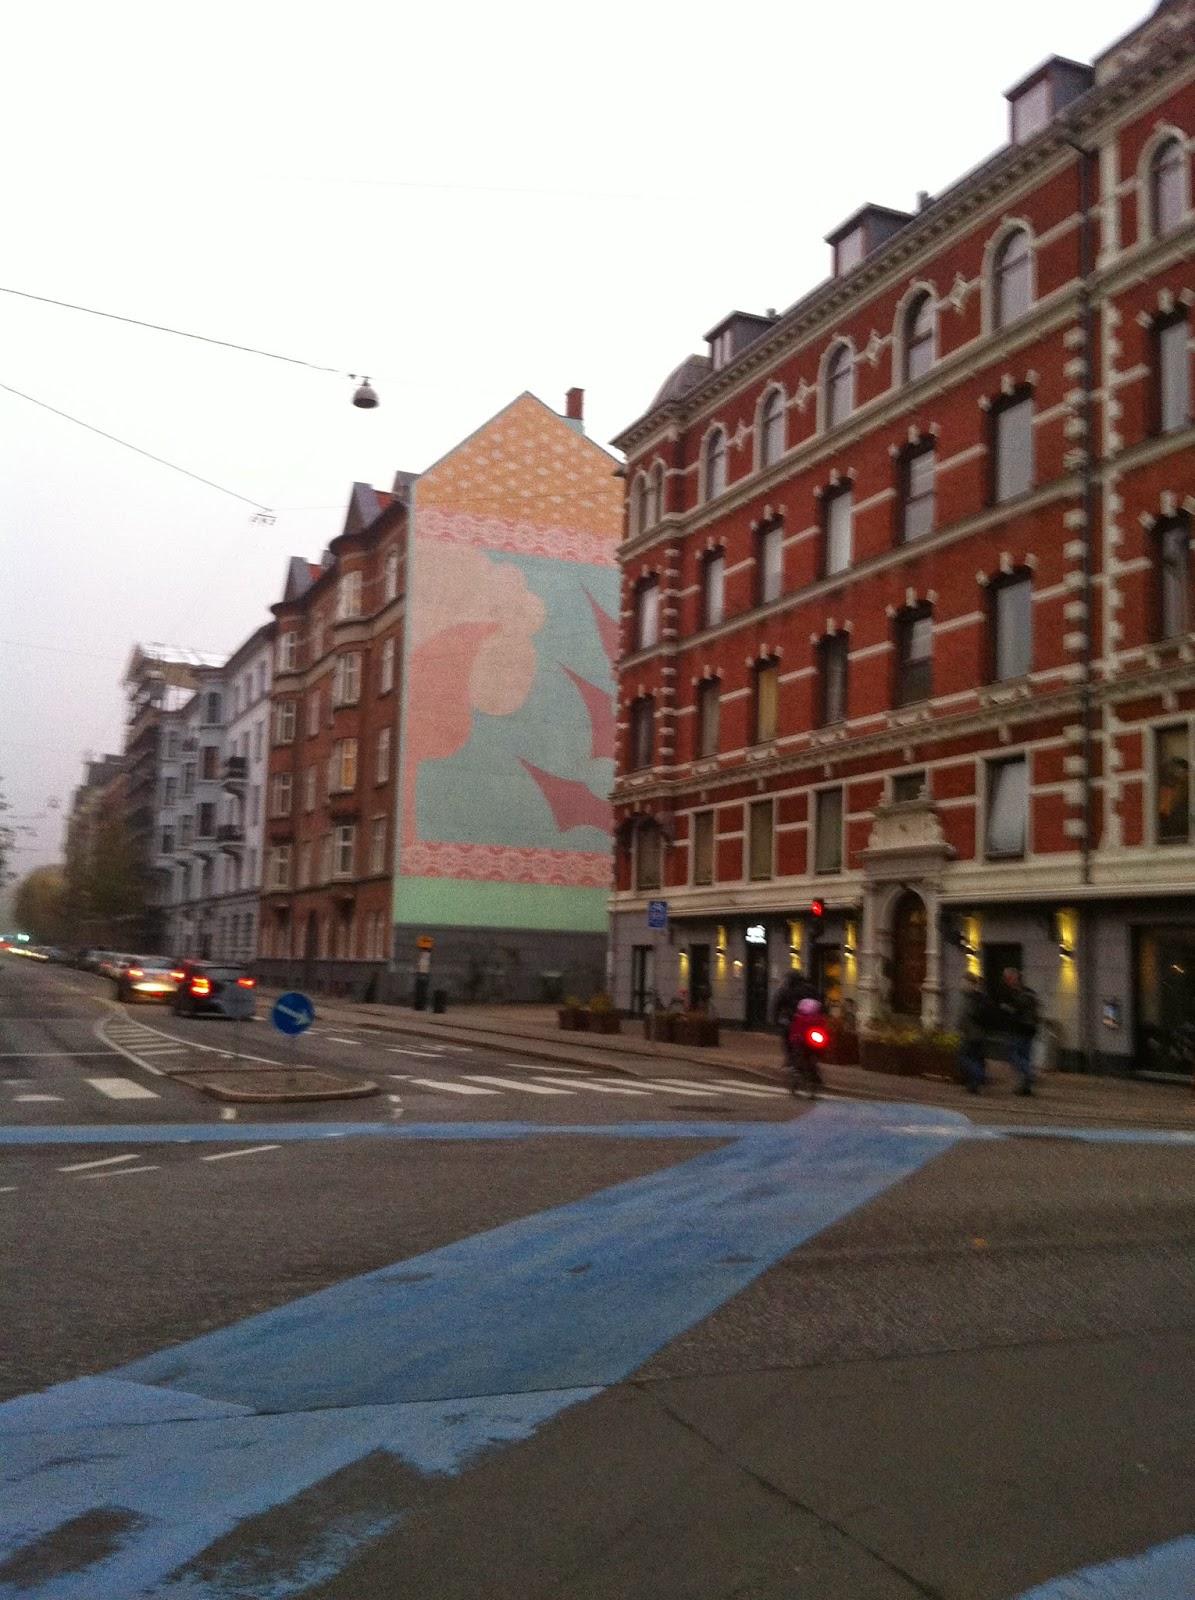 a pastel colored mural in copenhagen